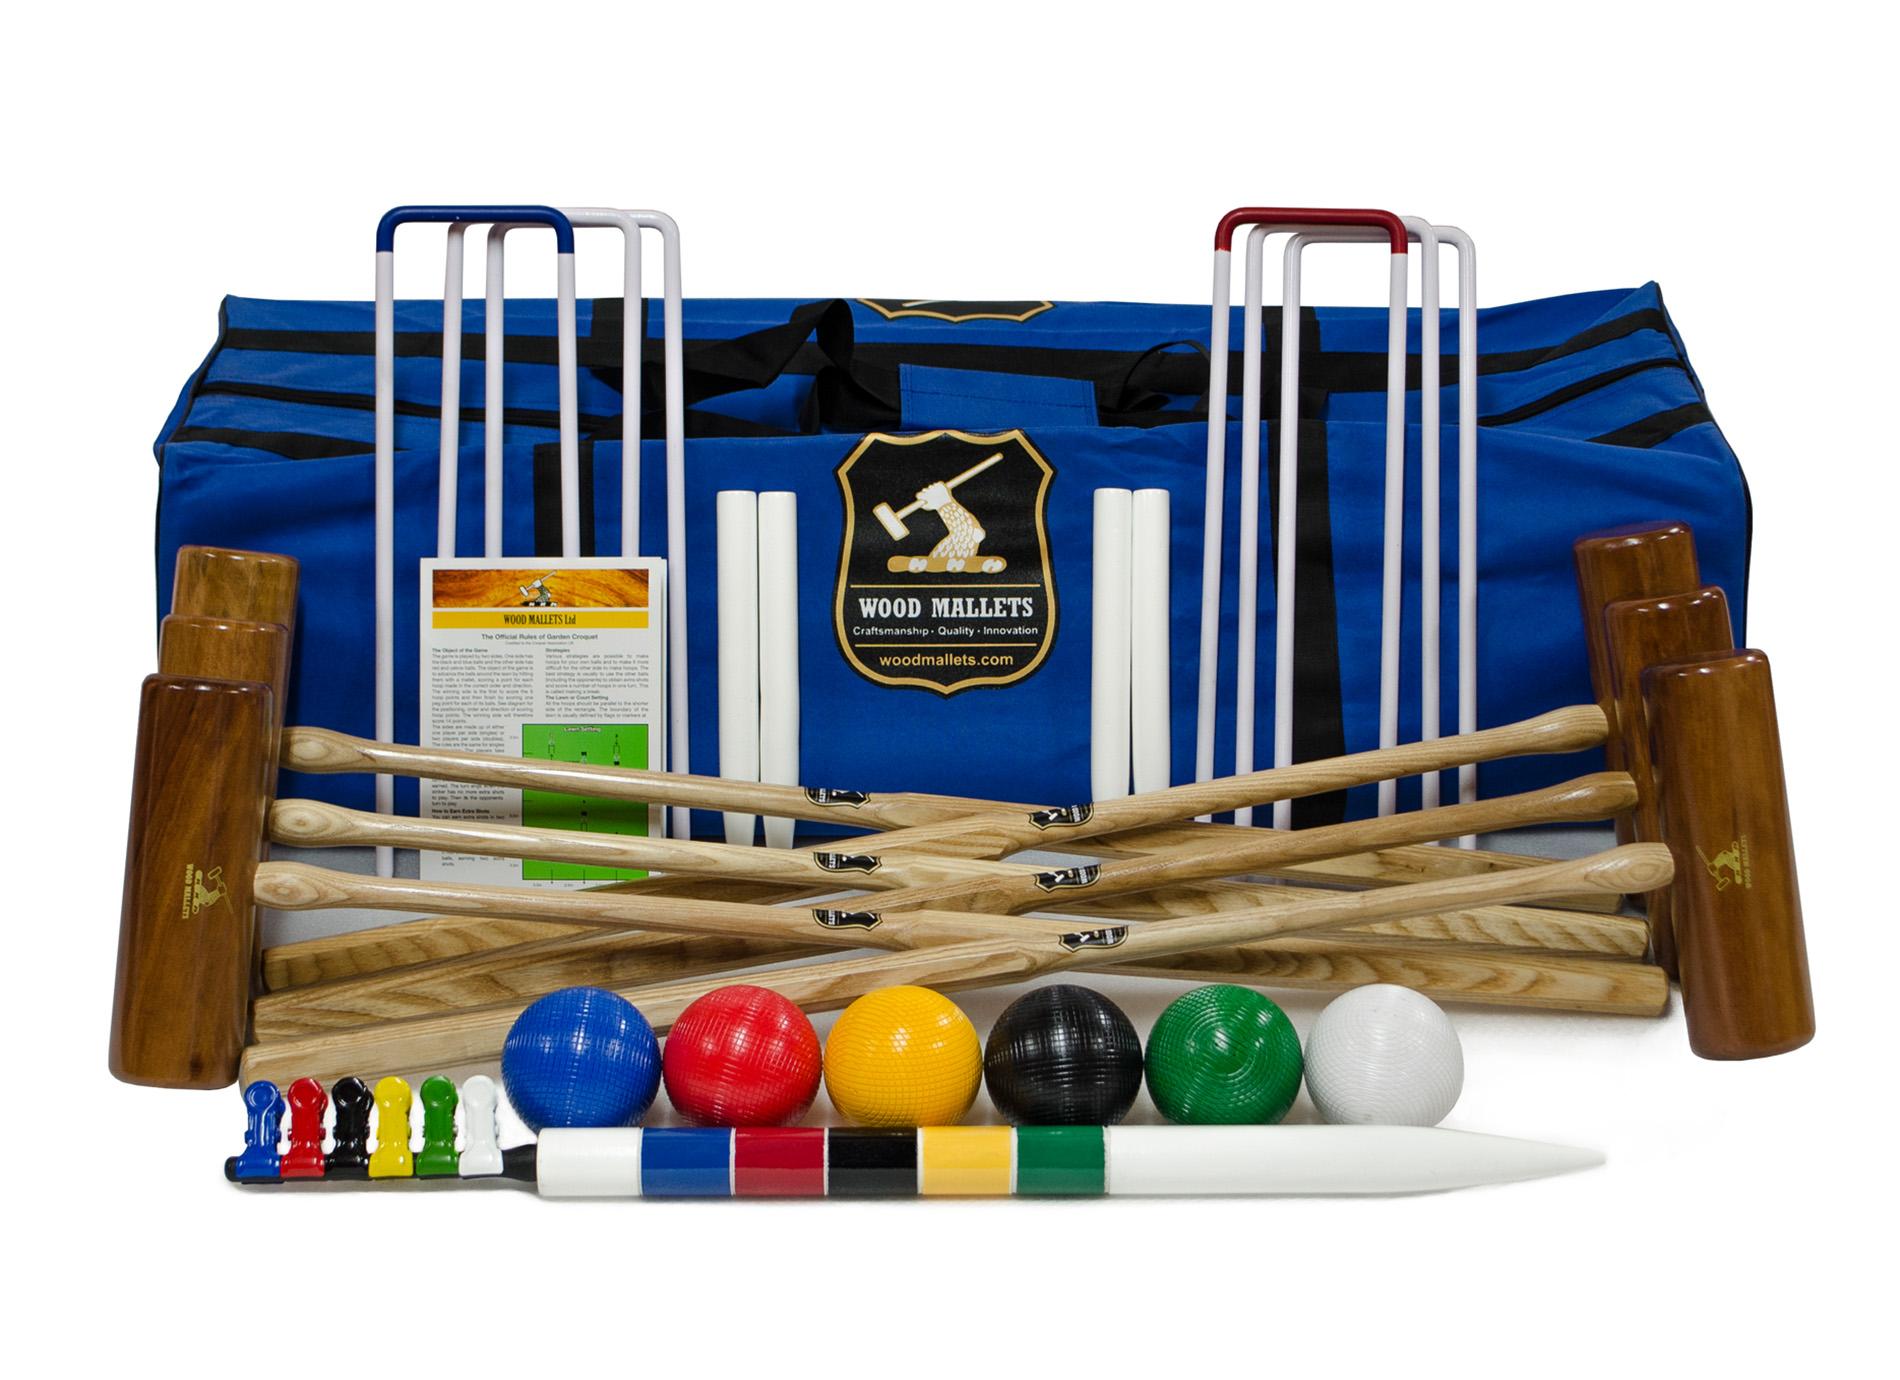 Cottage Set 6 Player Garden Croquet Set In A Bag with Hardwood Mallets